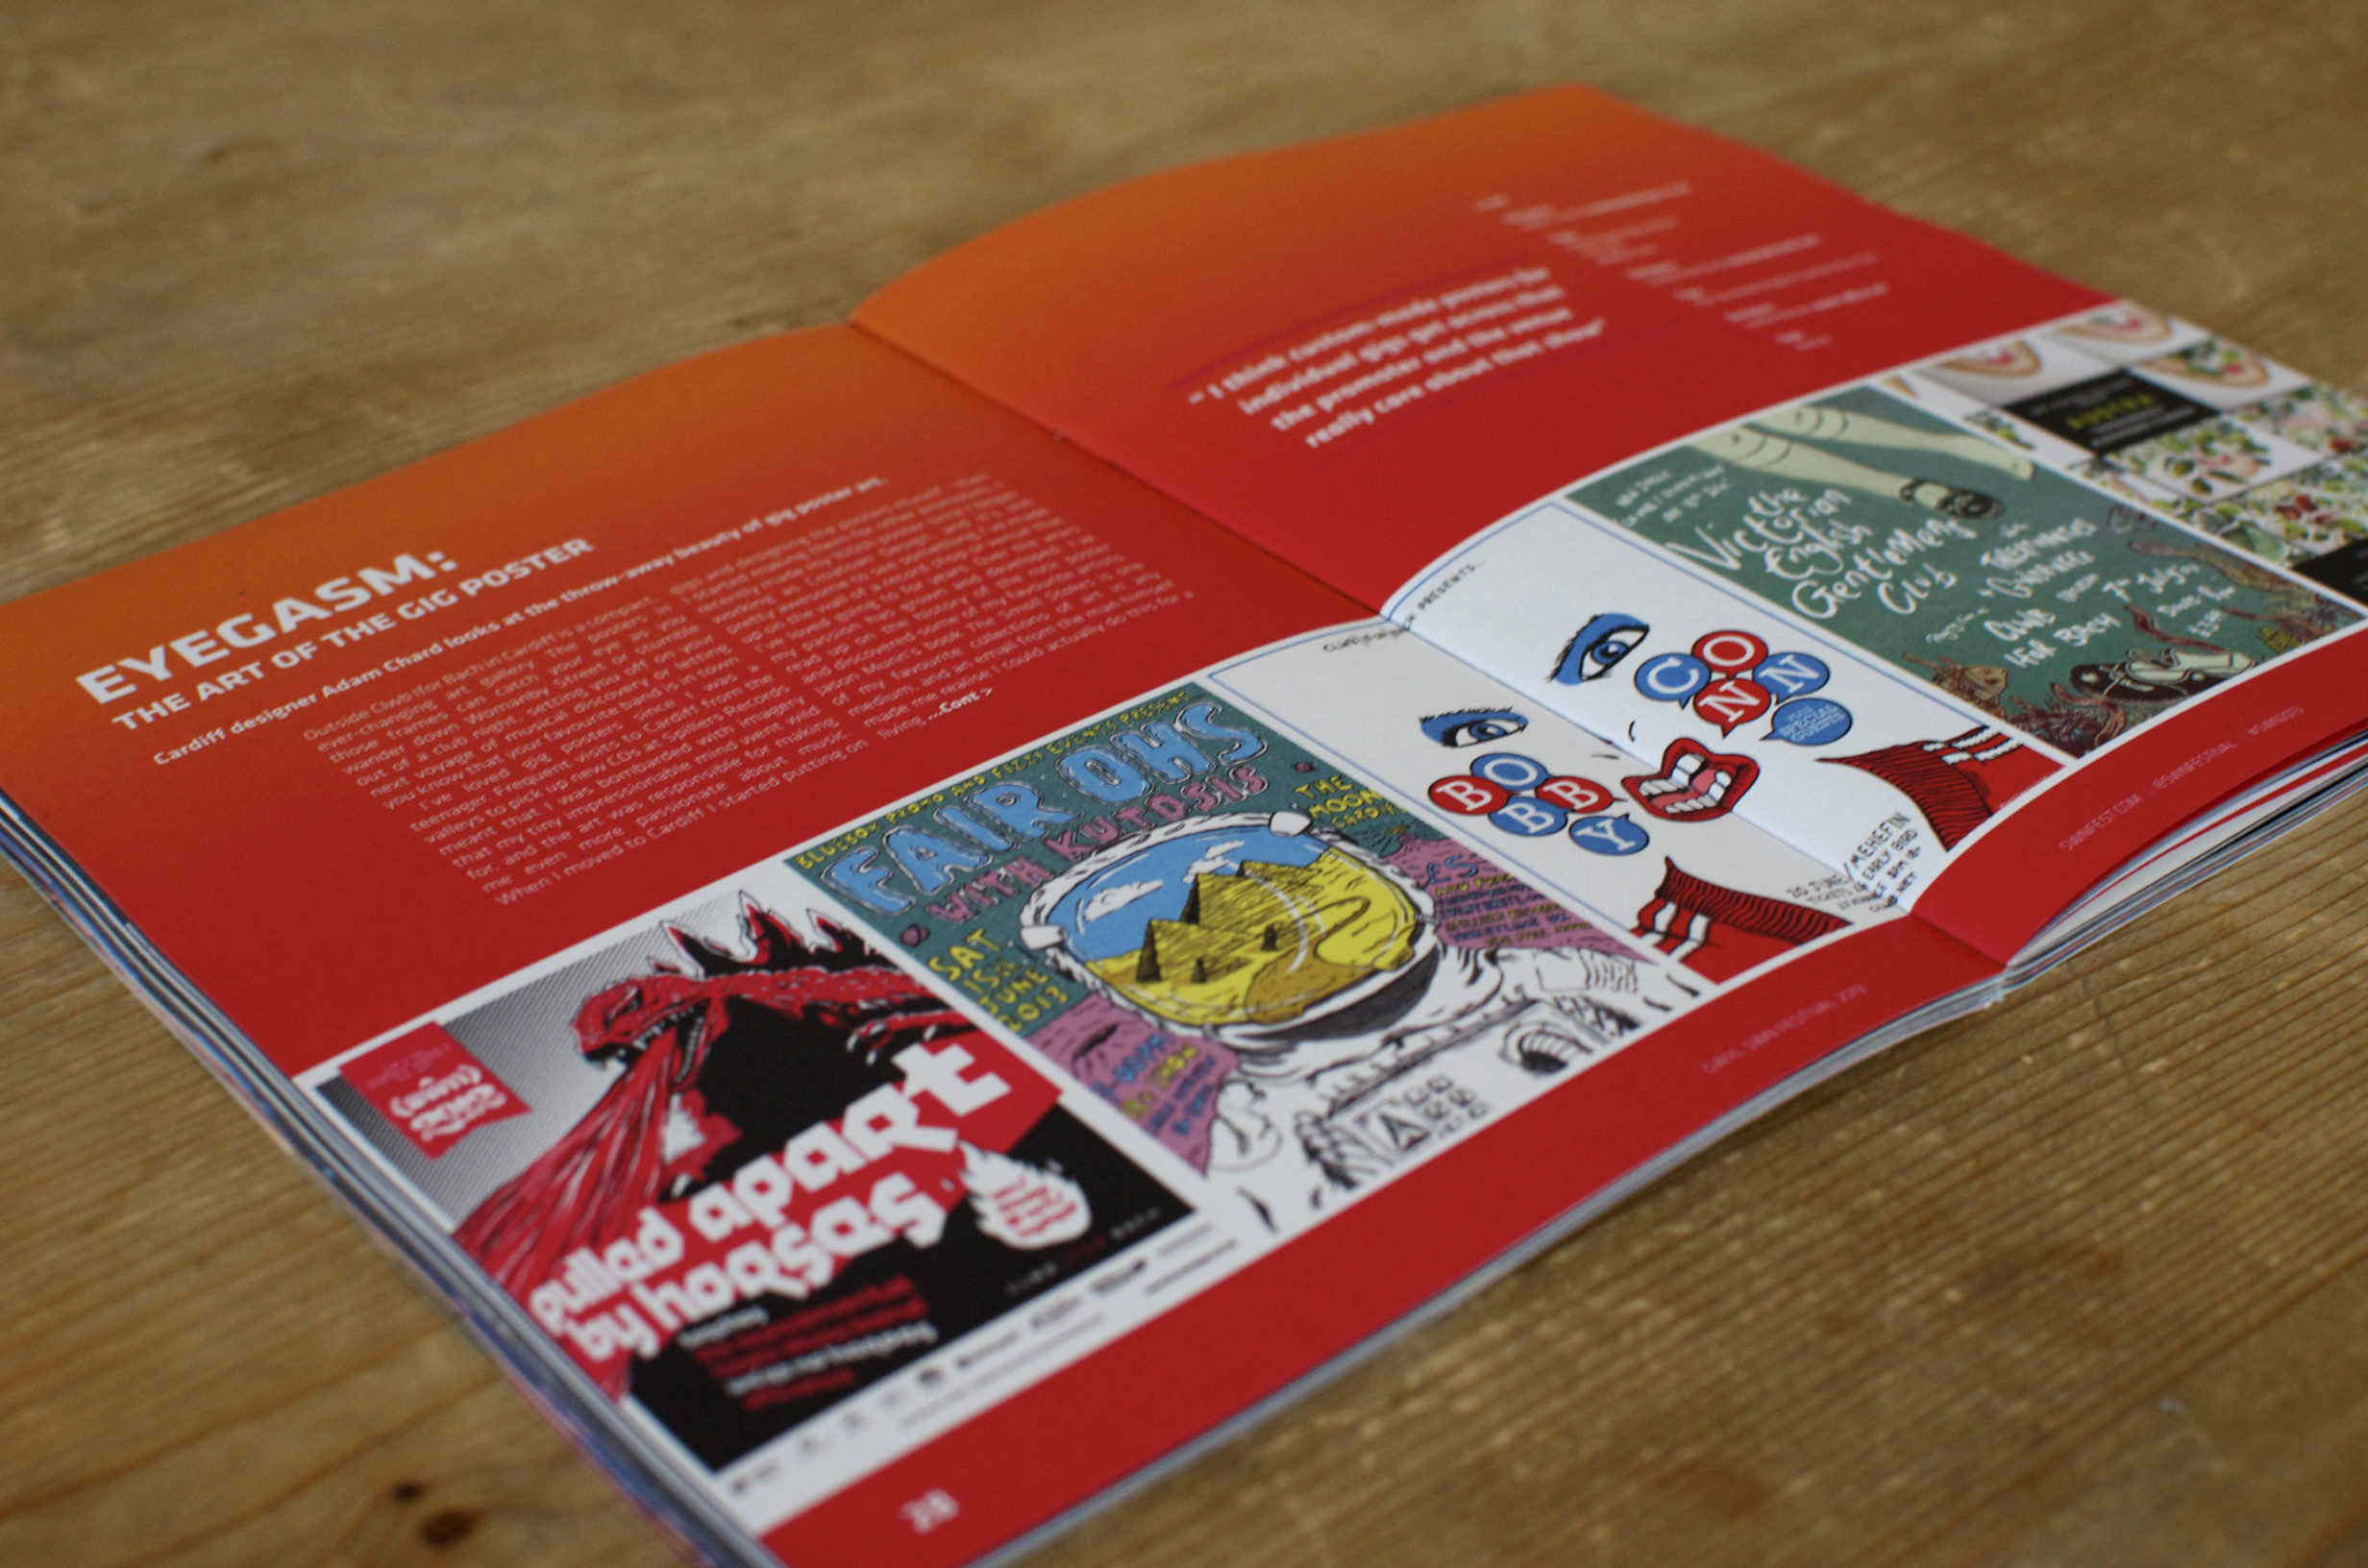 Image of a publication